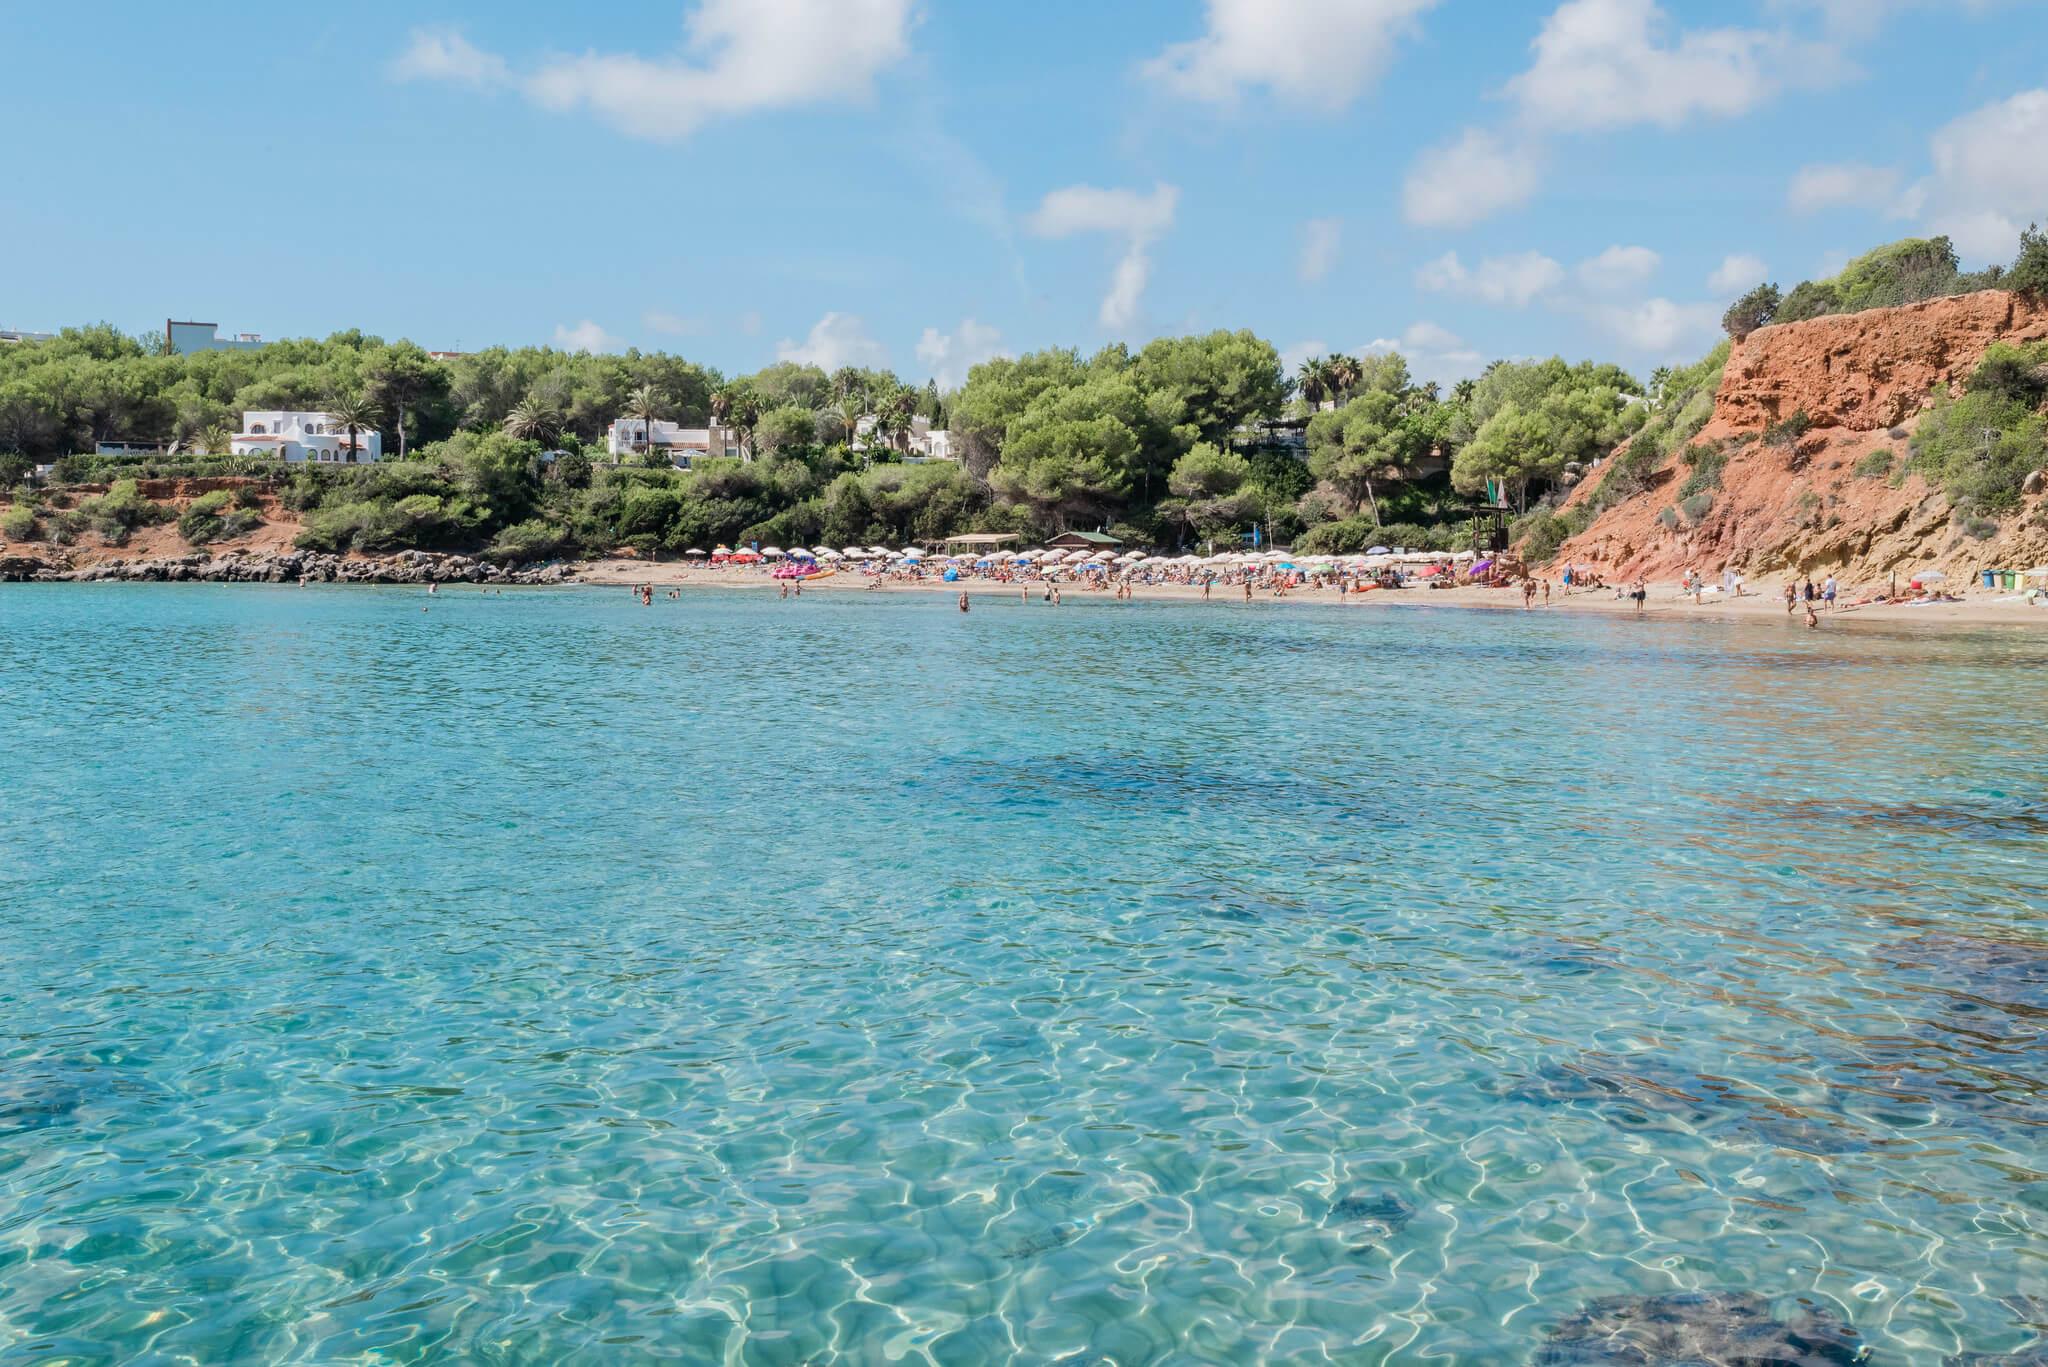 https://www.white-ibiza.com/wp-content/uploads/2020/03/ibiza-beaches-cala-llenya-01.jpg